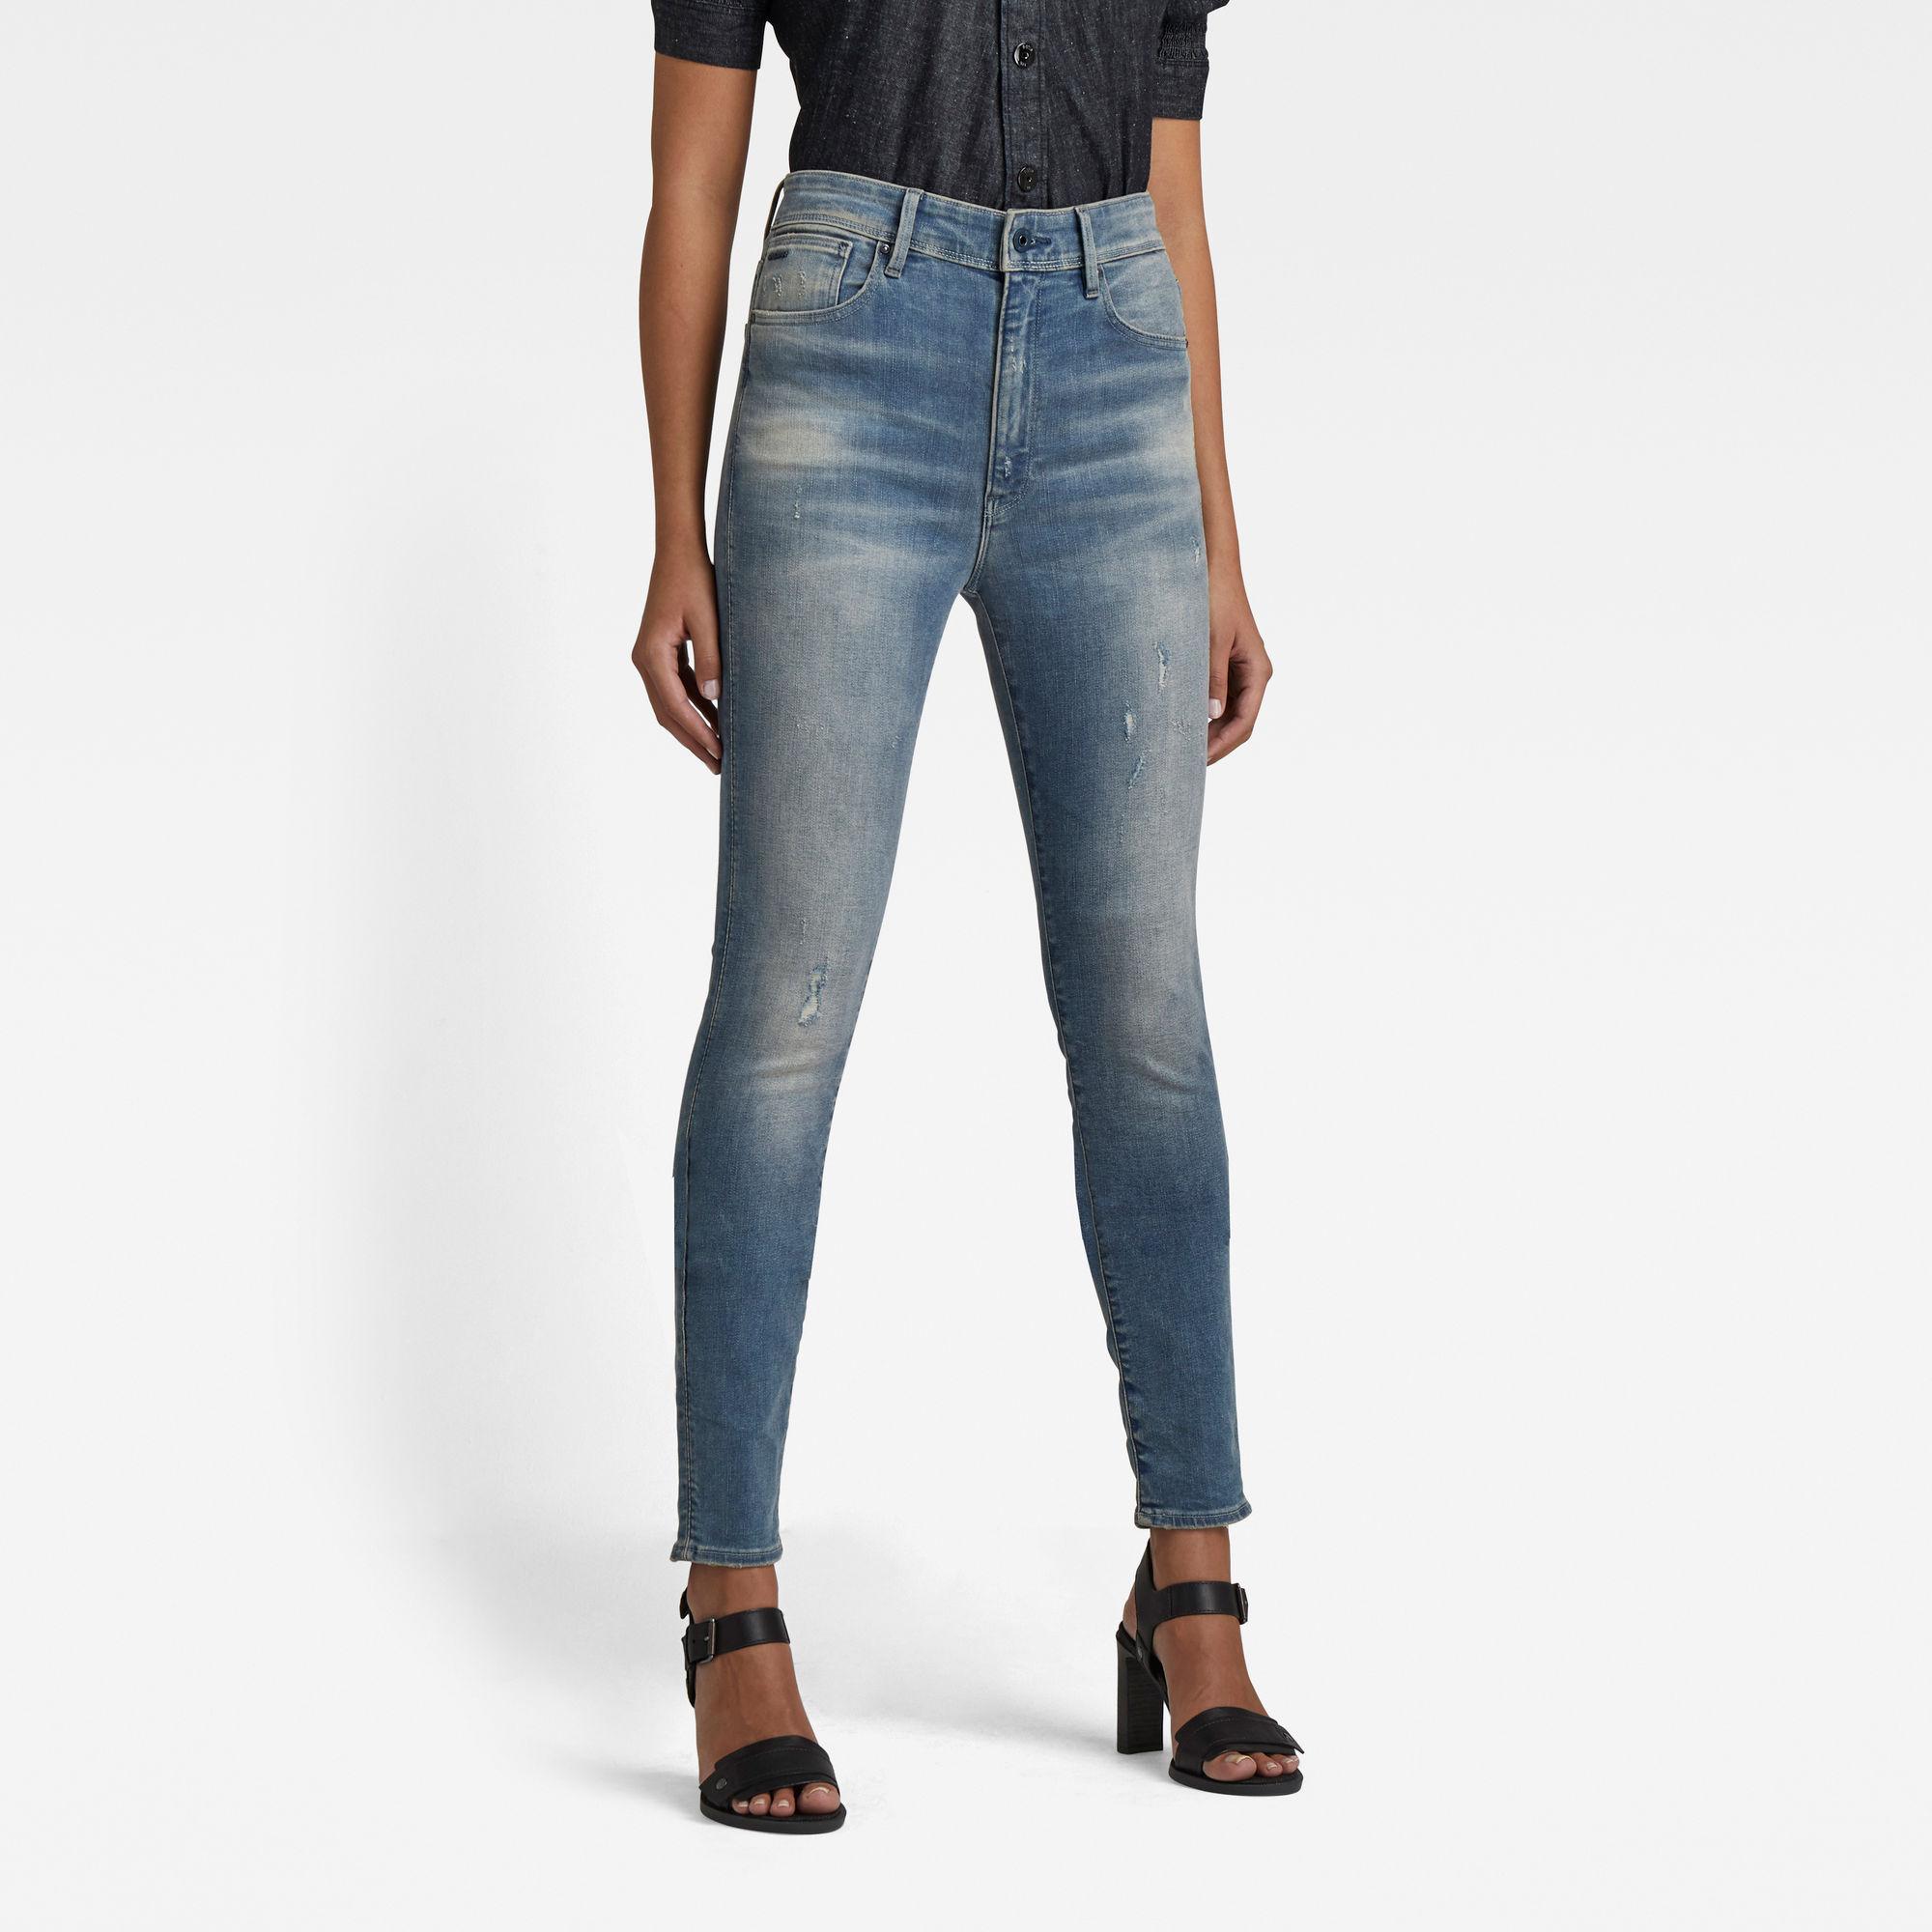 G-Star RAW Dames Kafey Ultra High Skinny Jeans Blauw